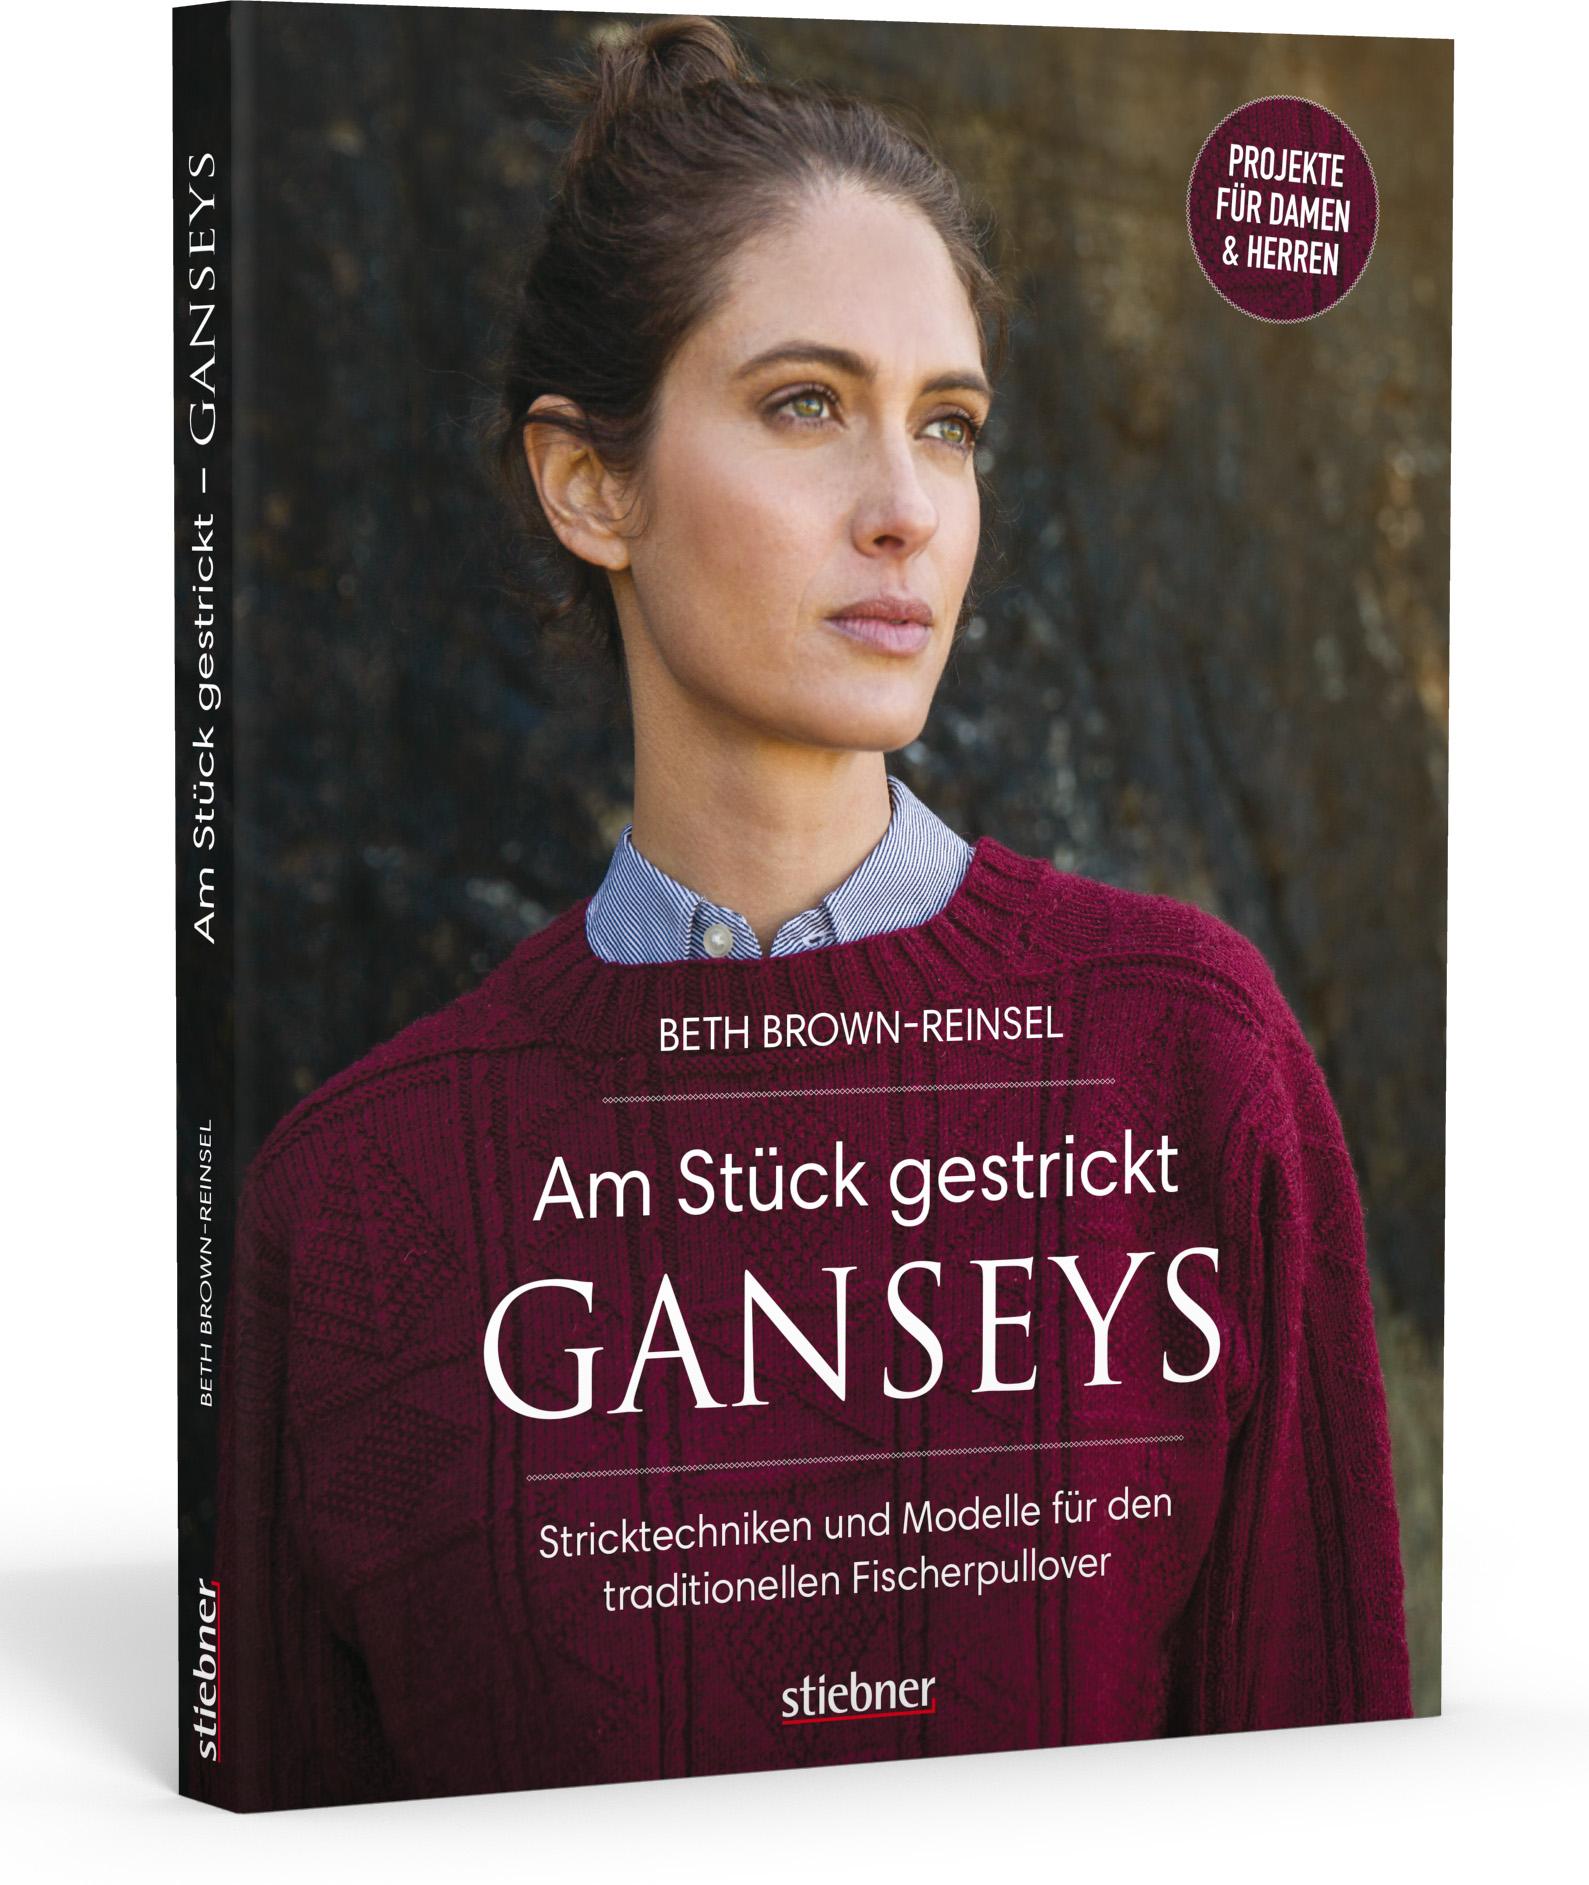 Ganseys